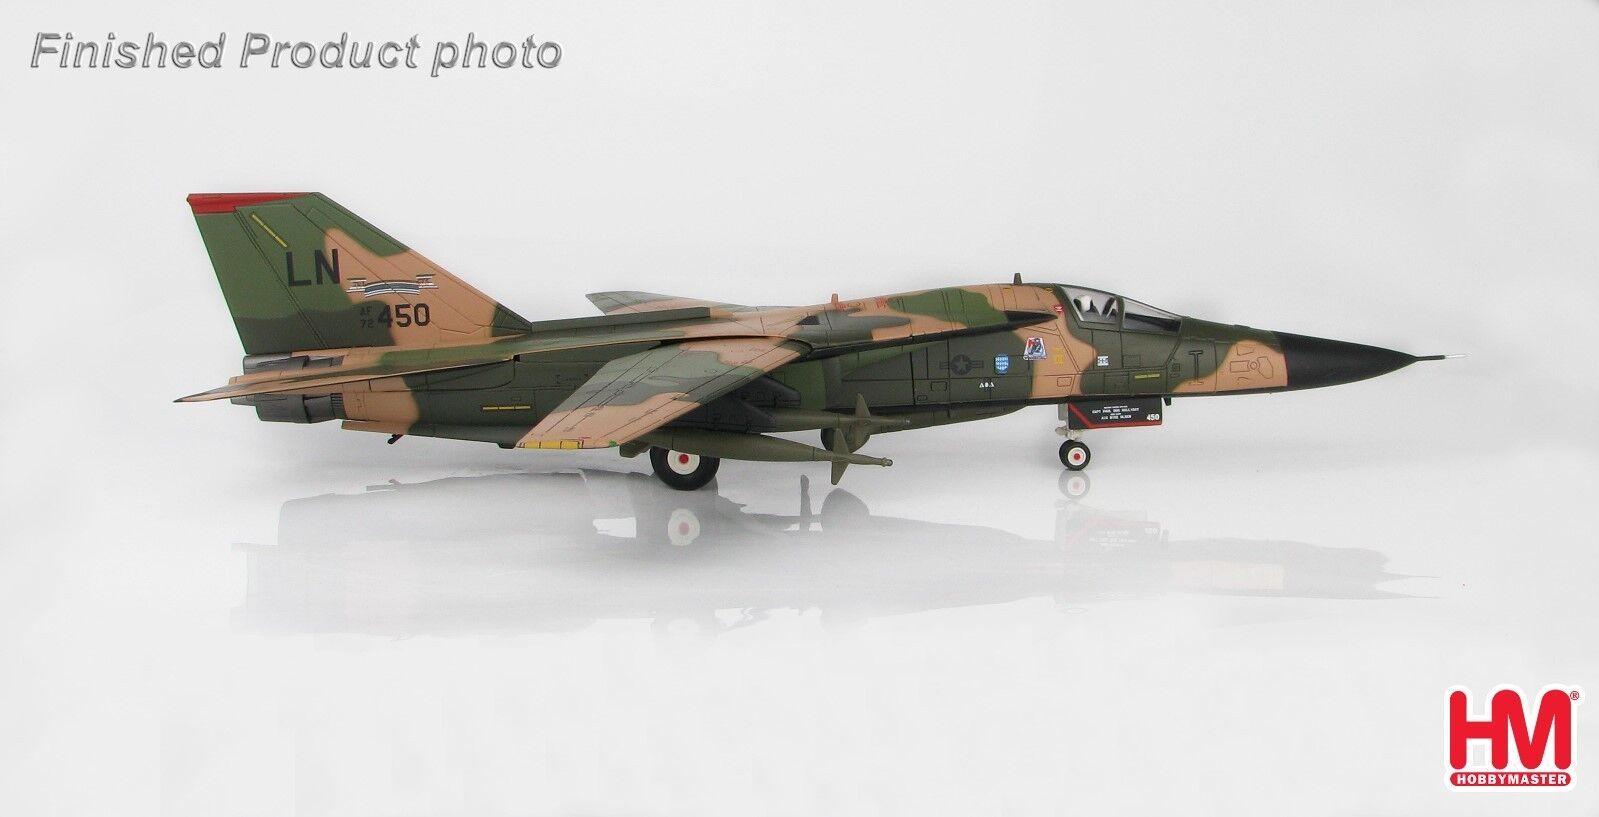 online barato Hobbymaster 1 72 HA3020 F-111F Aardvark 72-1450, 494th Tfs, Tfs, Tfs, Lakenheath 1992 MIB  Mejor precio